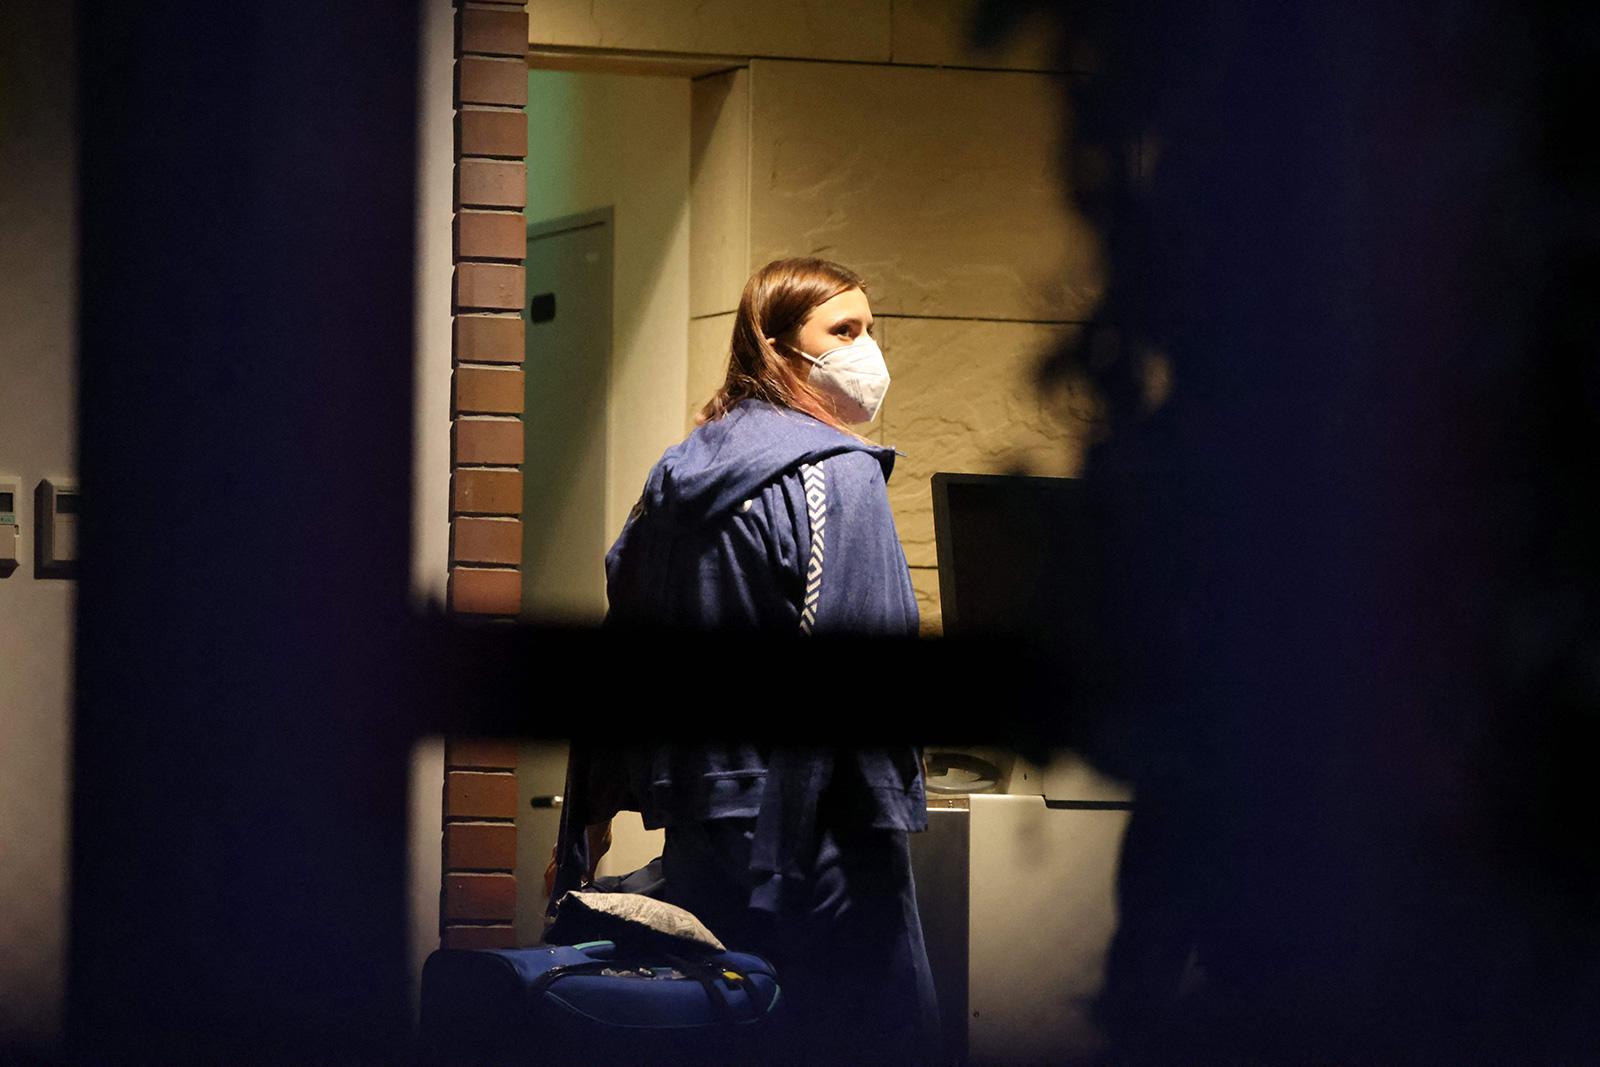 Belarus athlete Kristina Timanovskaya walks with her luggage inside the Polish embassy in Tokyo on August 2.